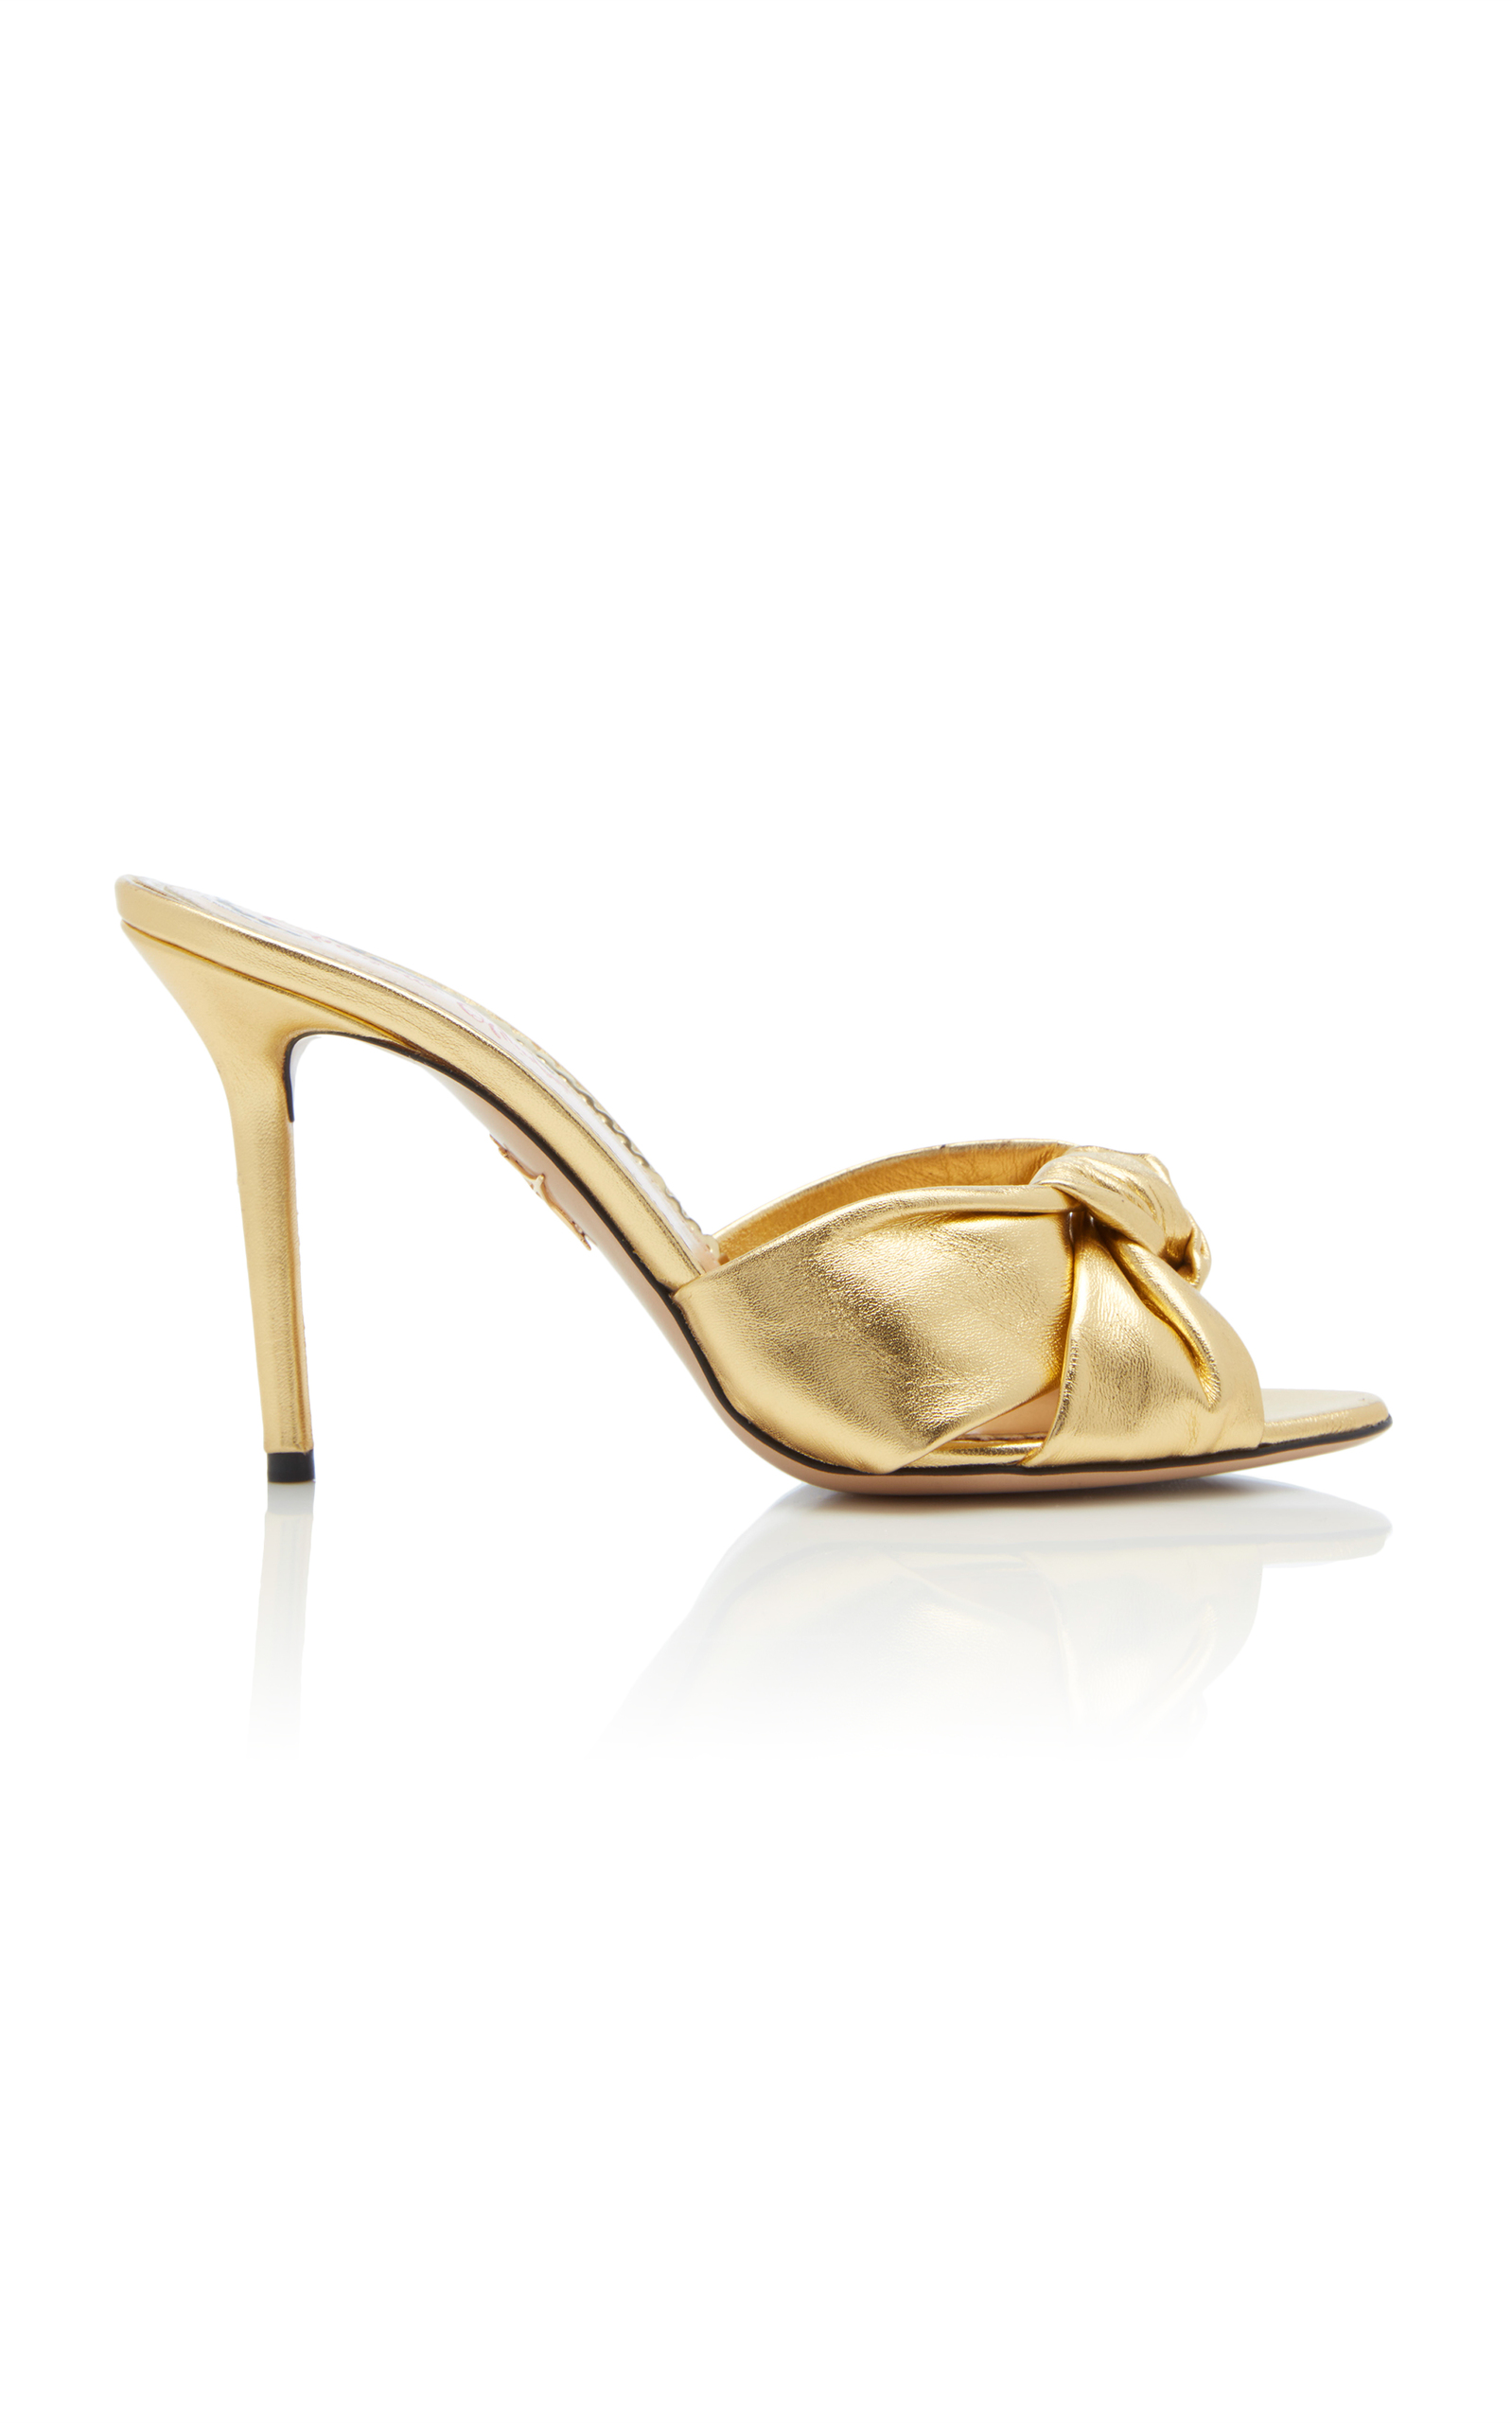 Lola sandals - Metallic Charlotte Olympia O41Cl